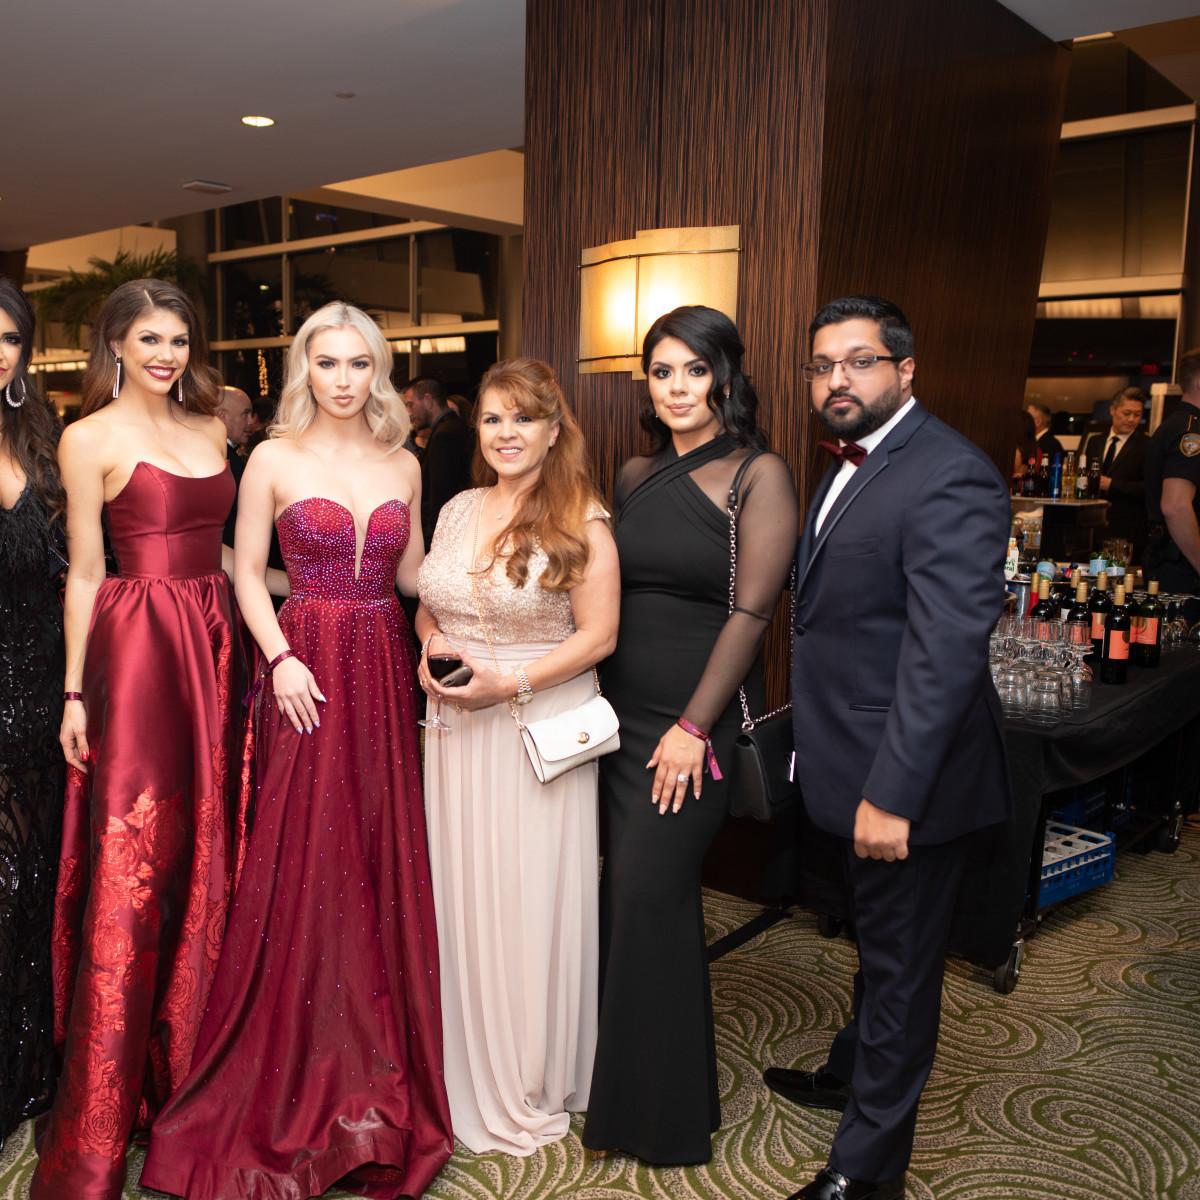 Altus Gala 2019 Nissreen Nasif, Libby Hill, Sasha Libby, Stepheny Jacquez, and Samik Haleeq